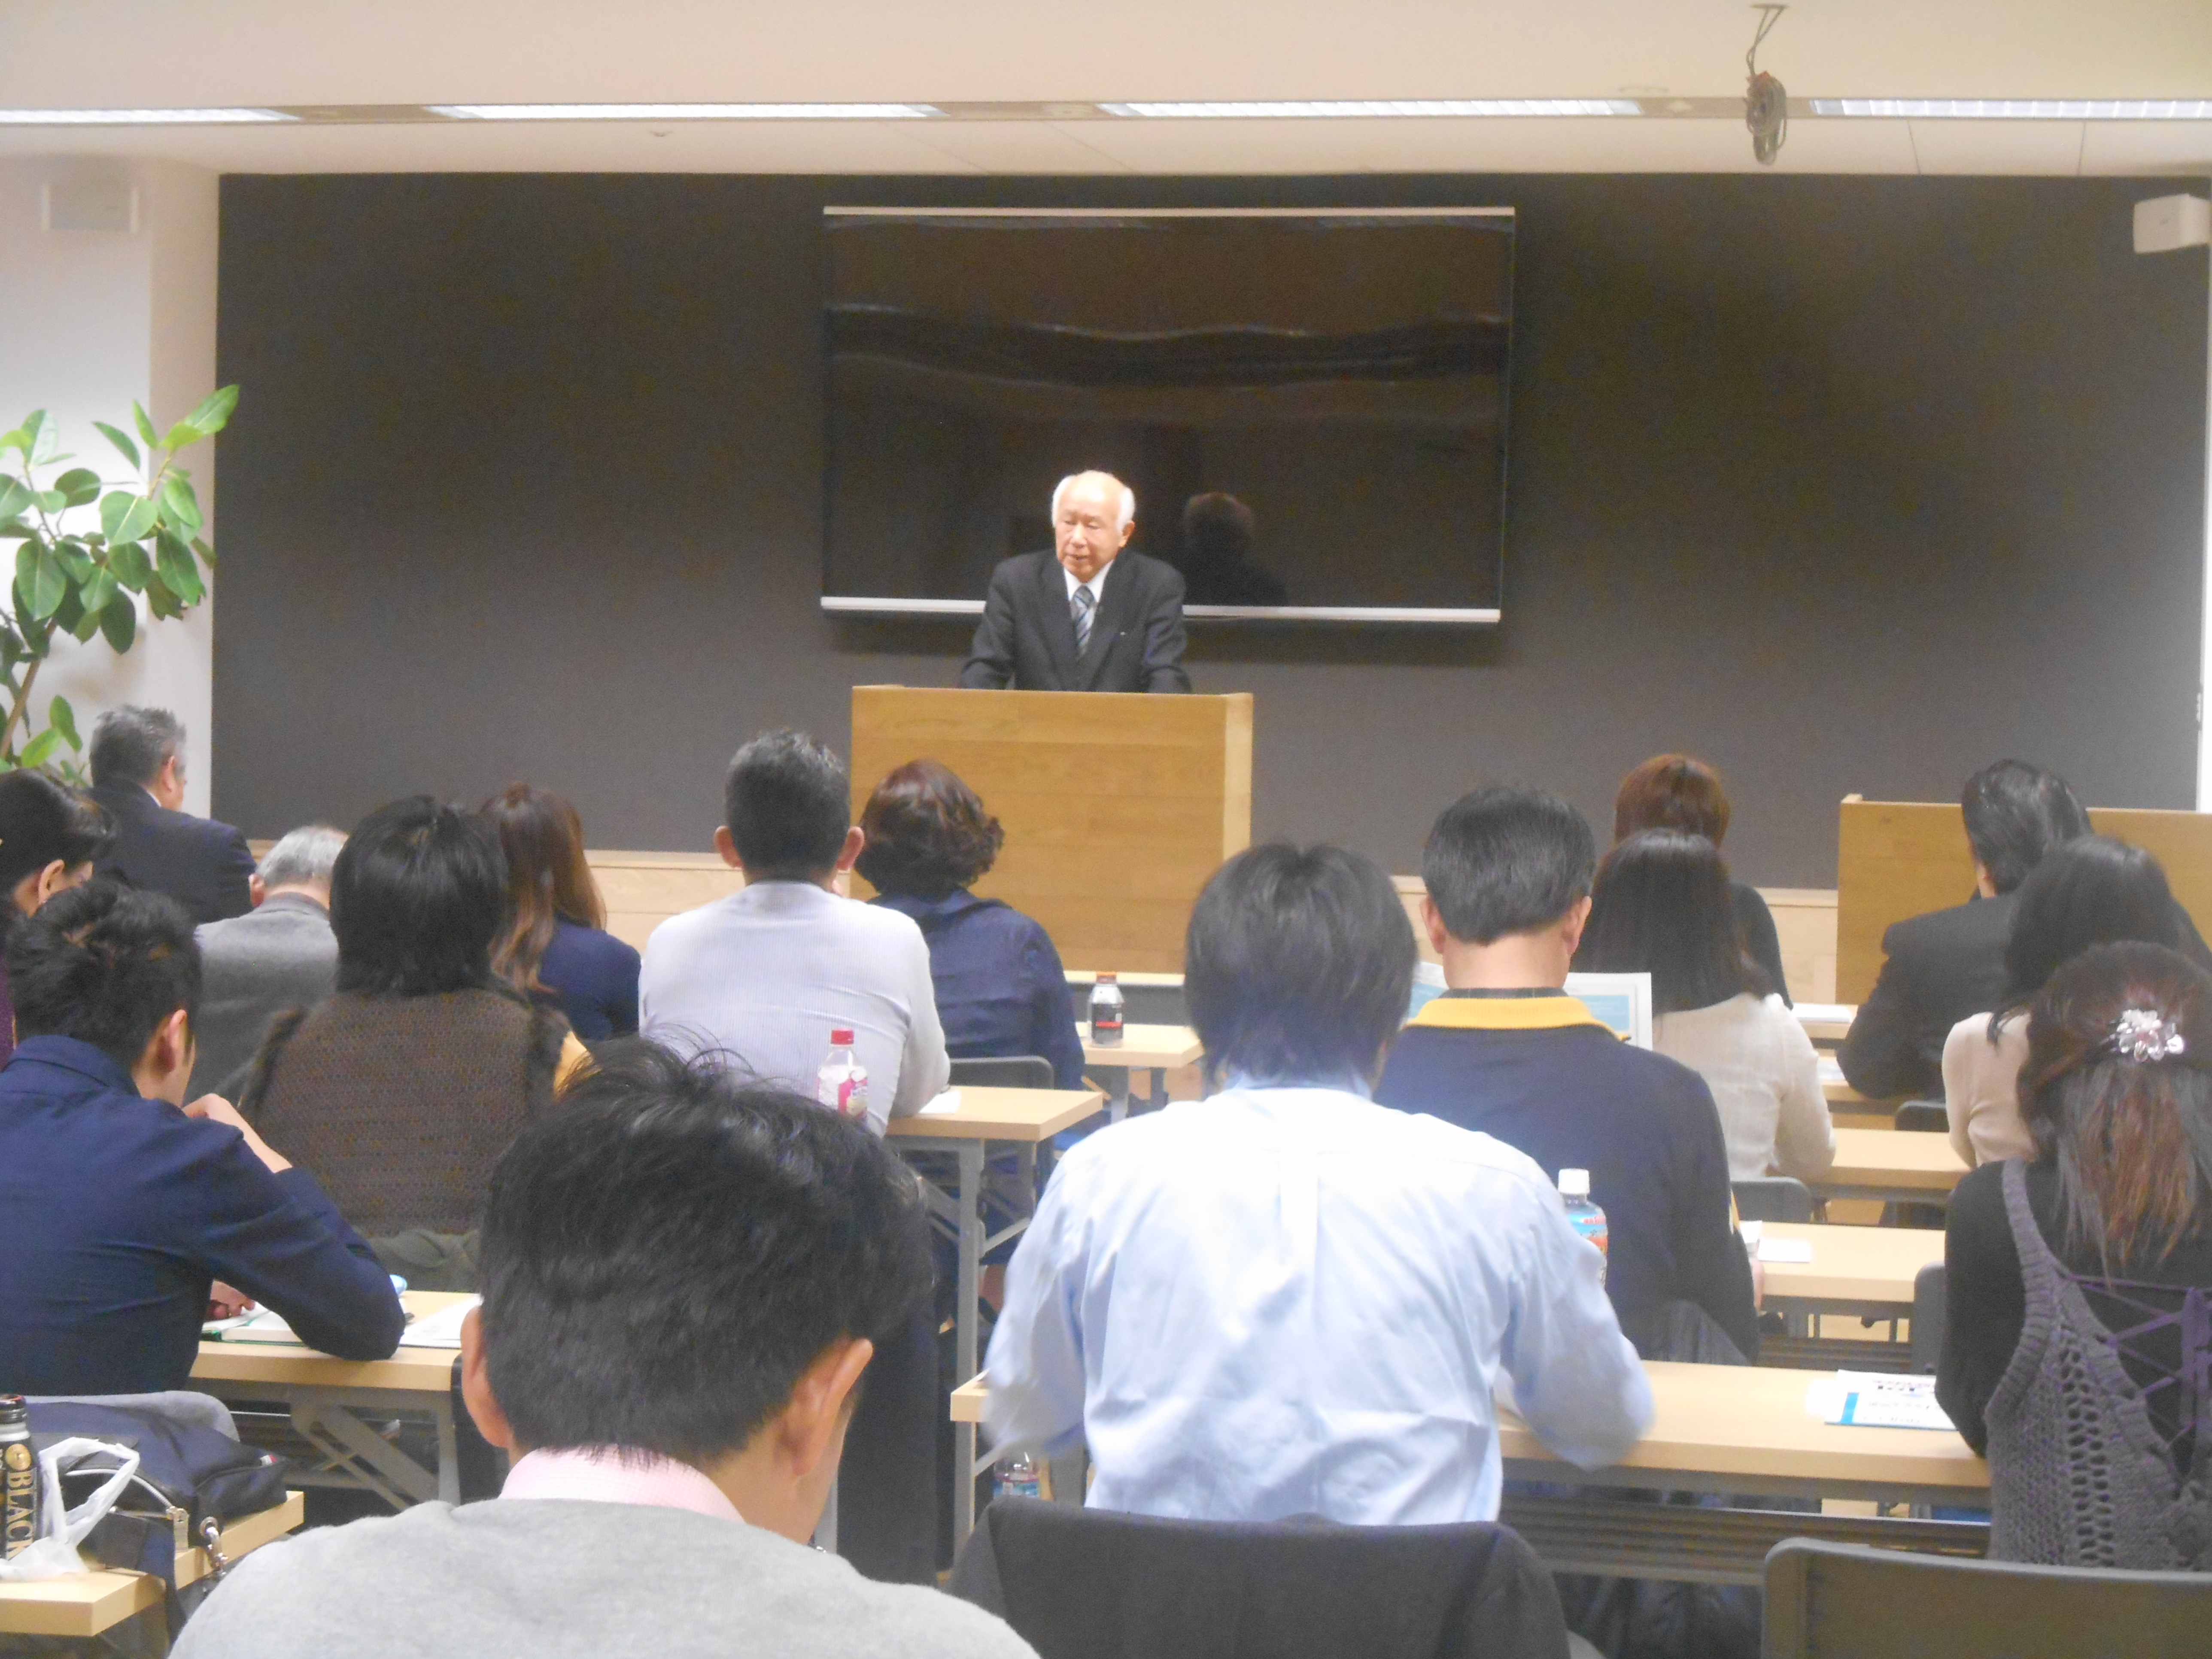 DSCN0456 - 4月1日東京思風塾の開催になります。